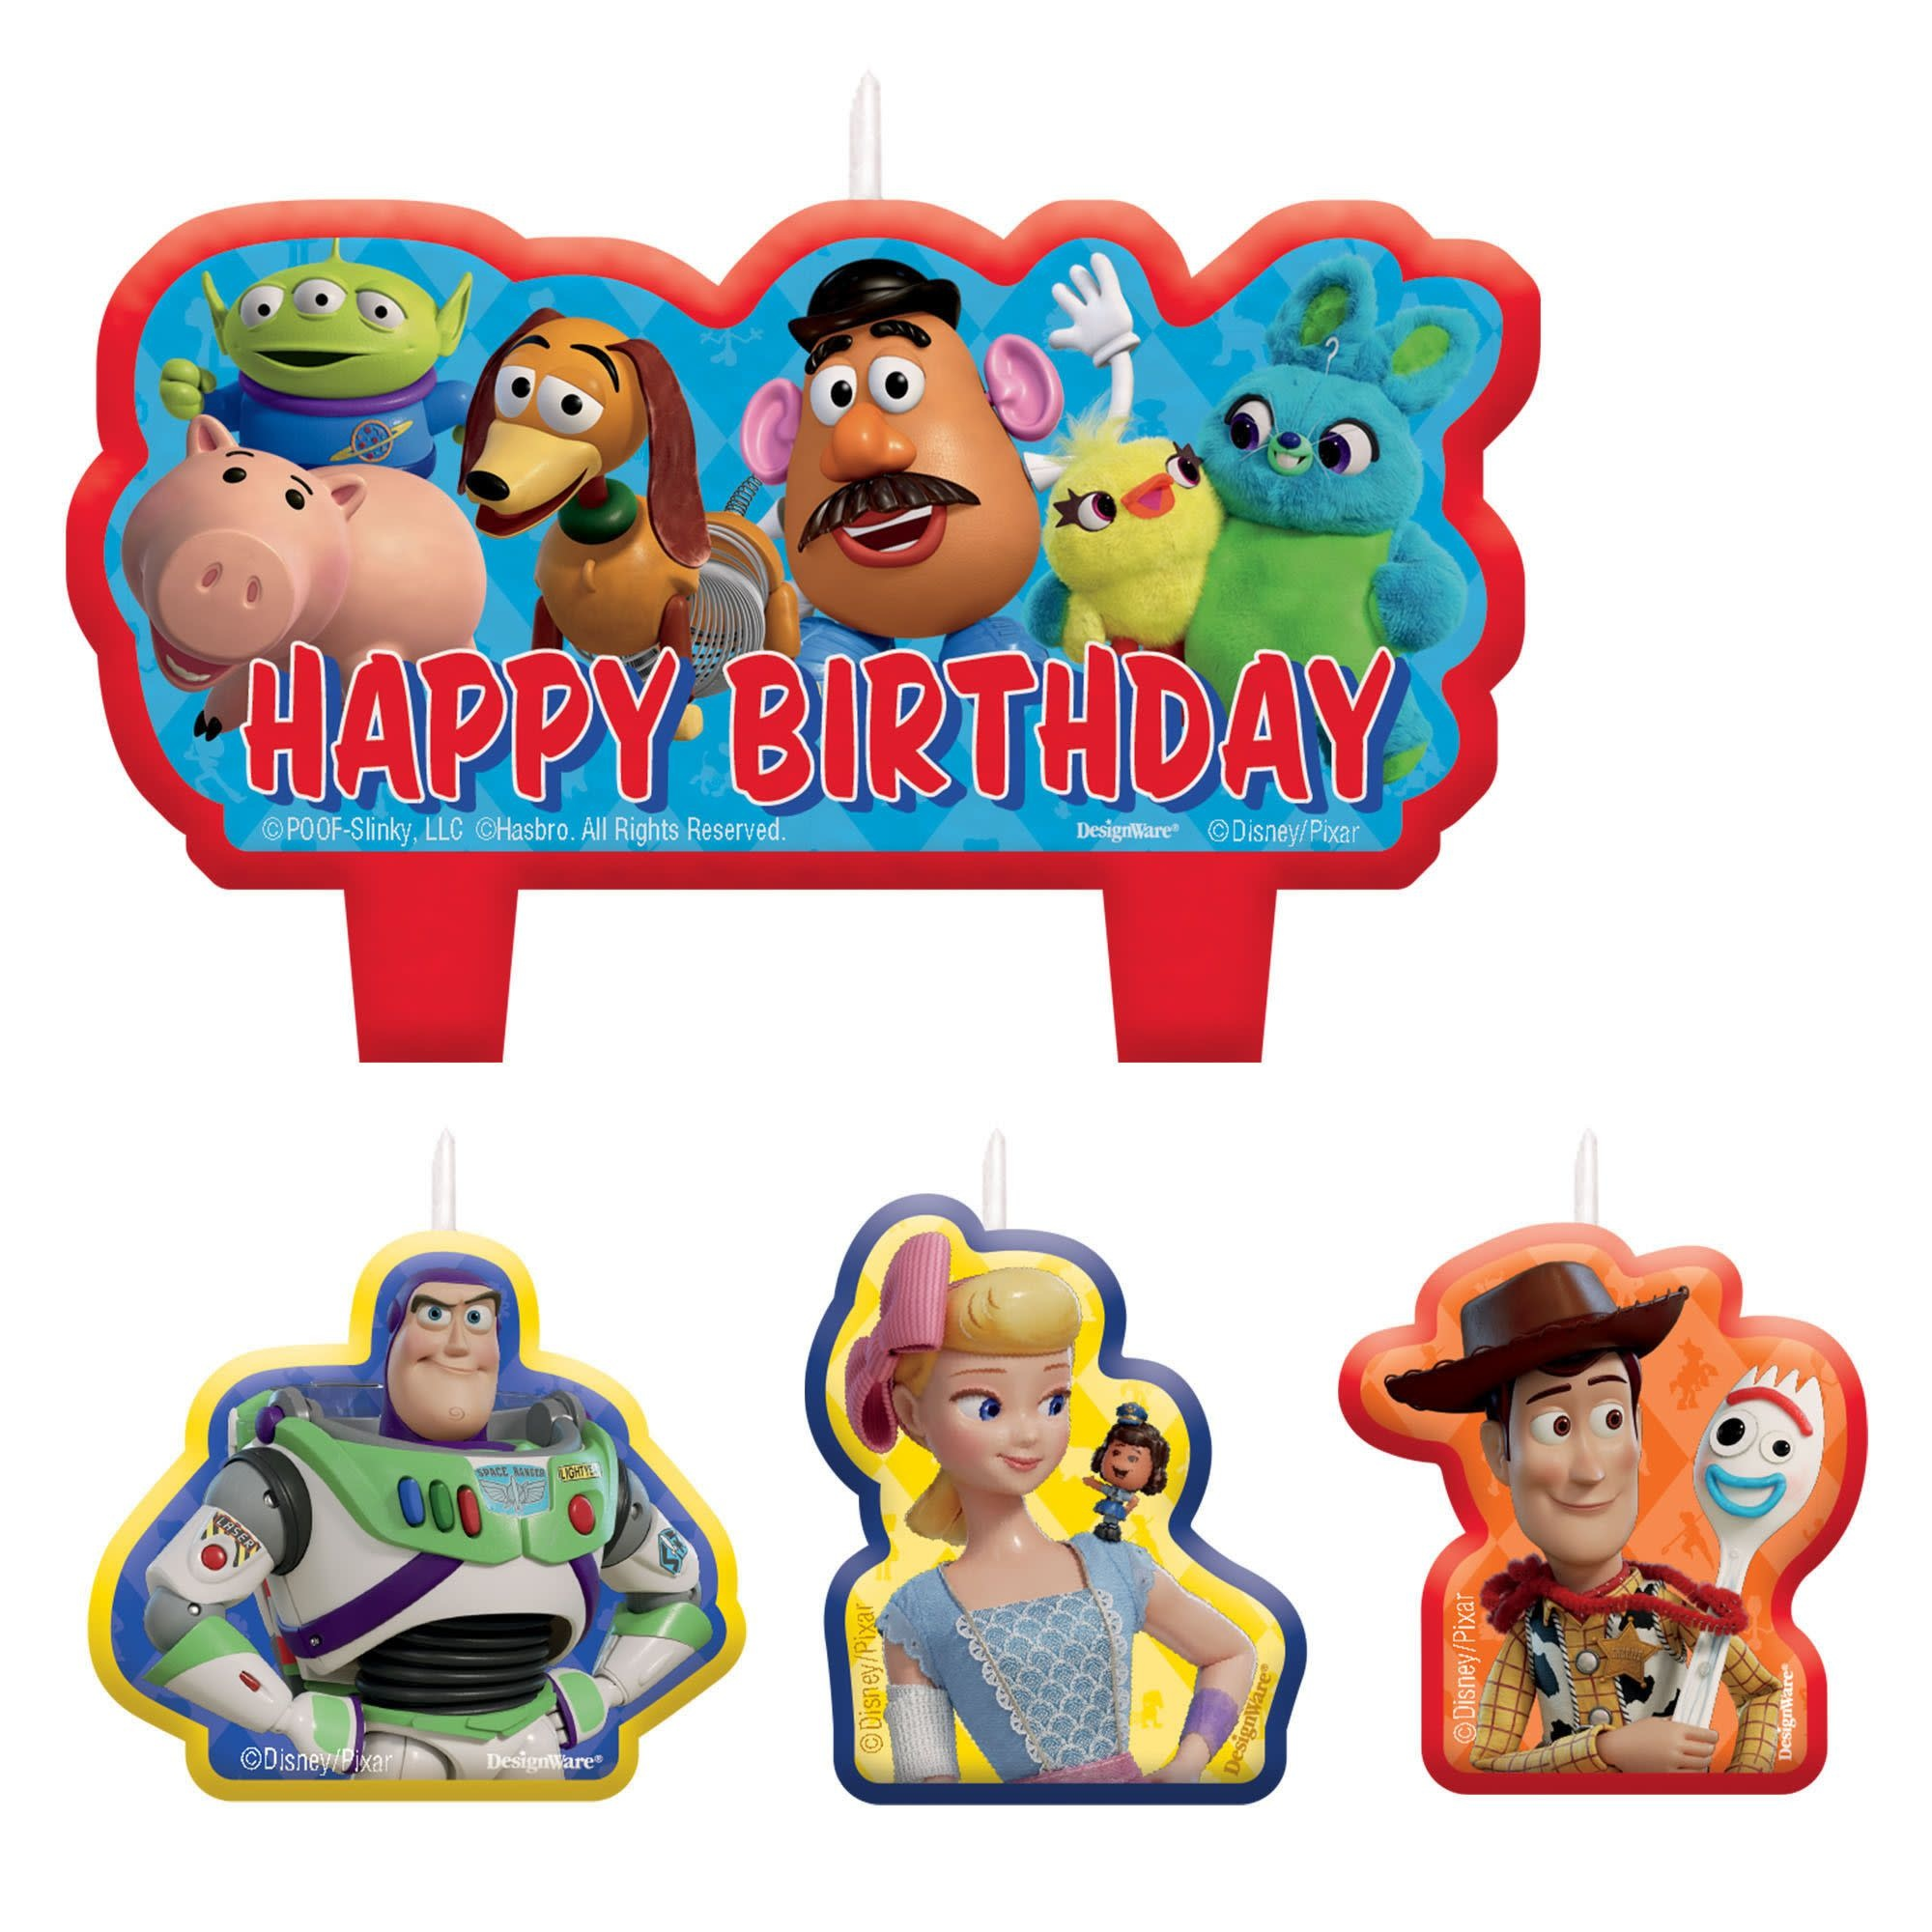 ©Disney/Pixar Toy Story 4 Birthday Candle Set